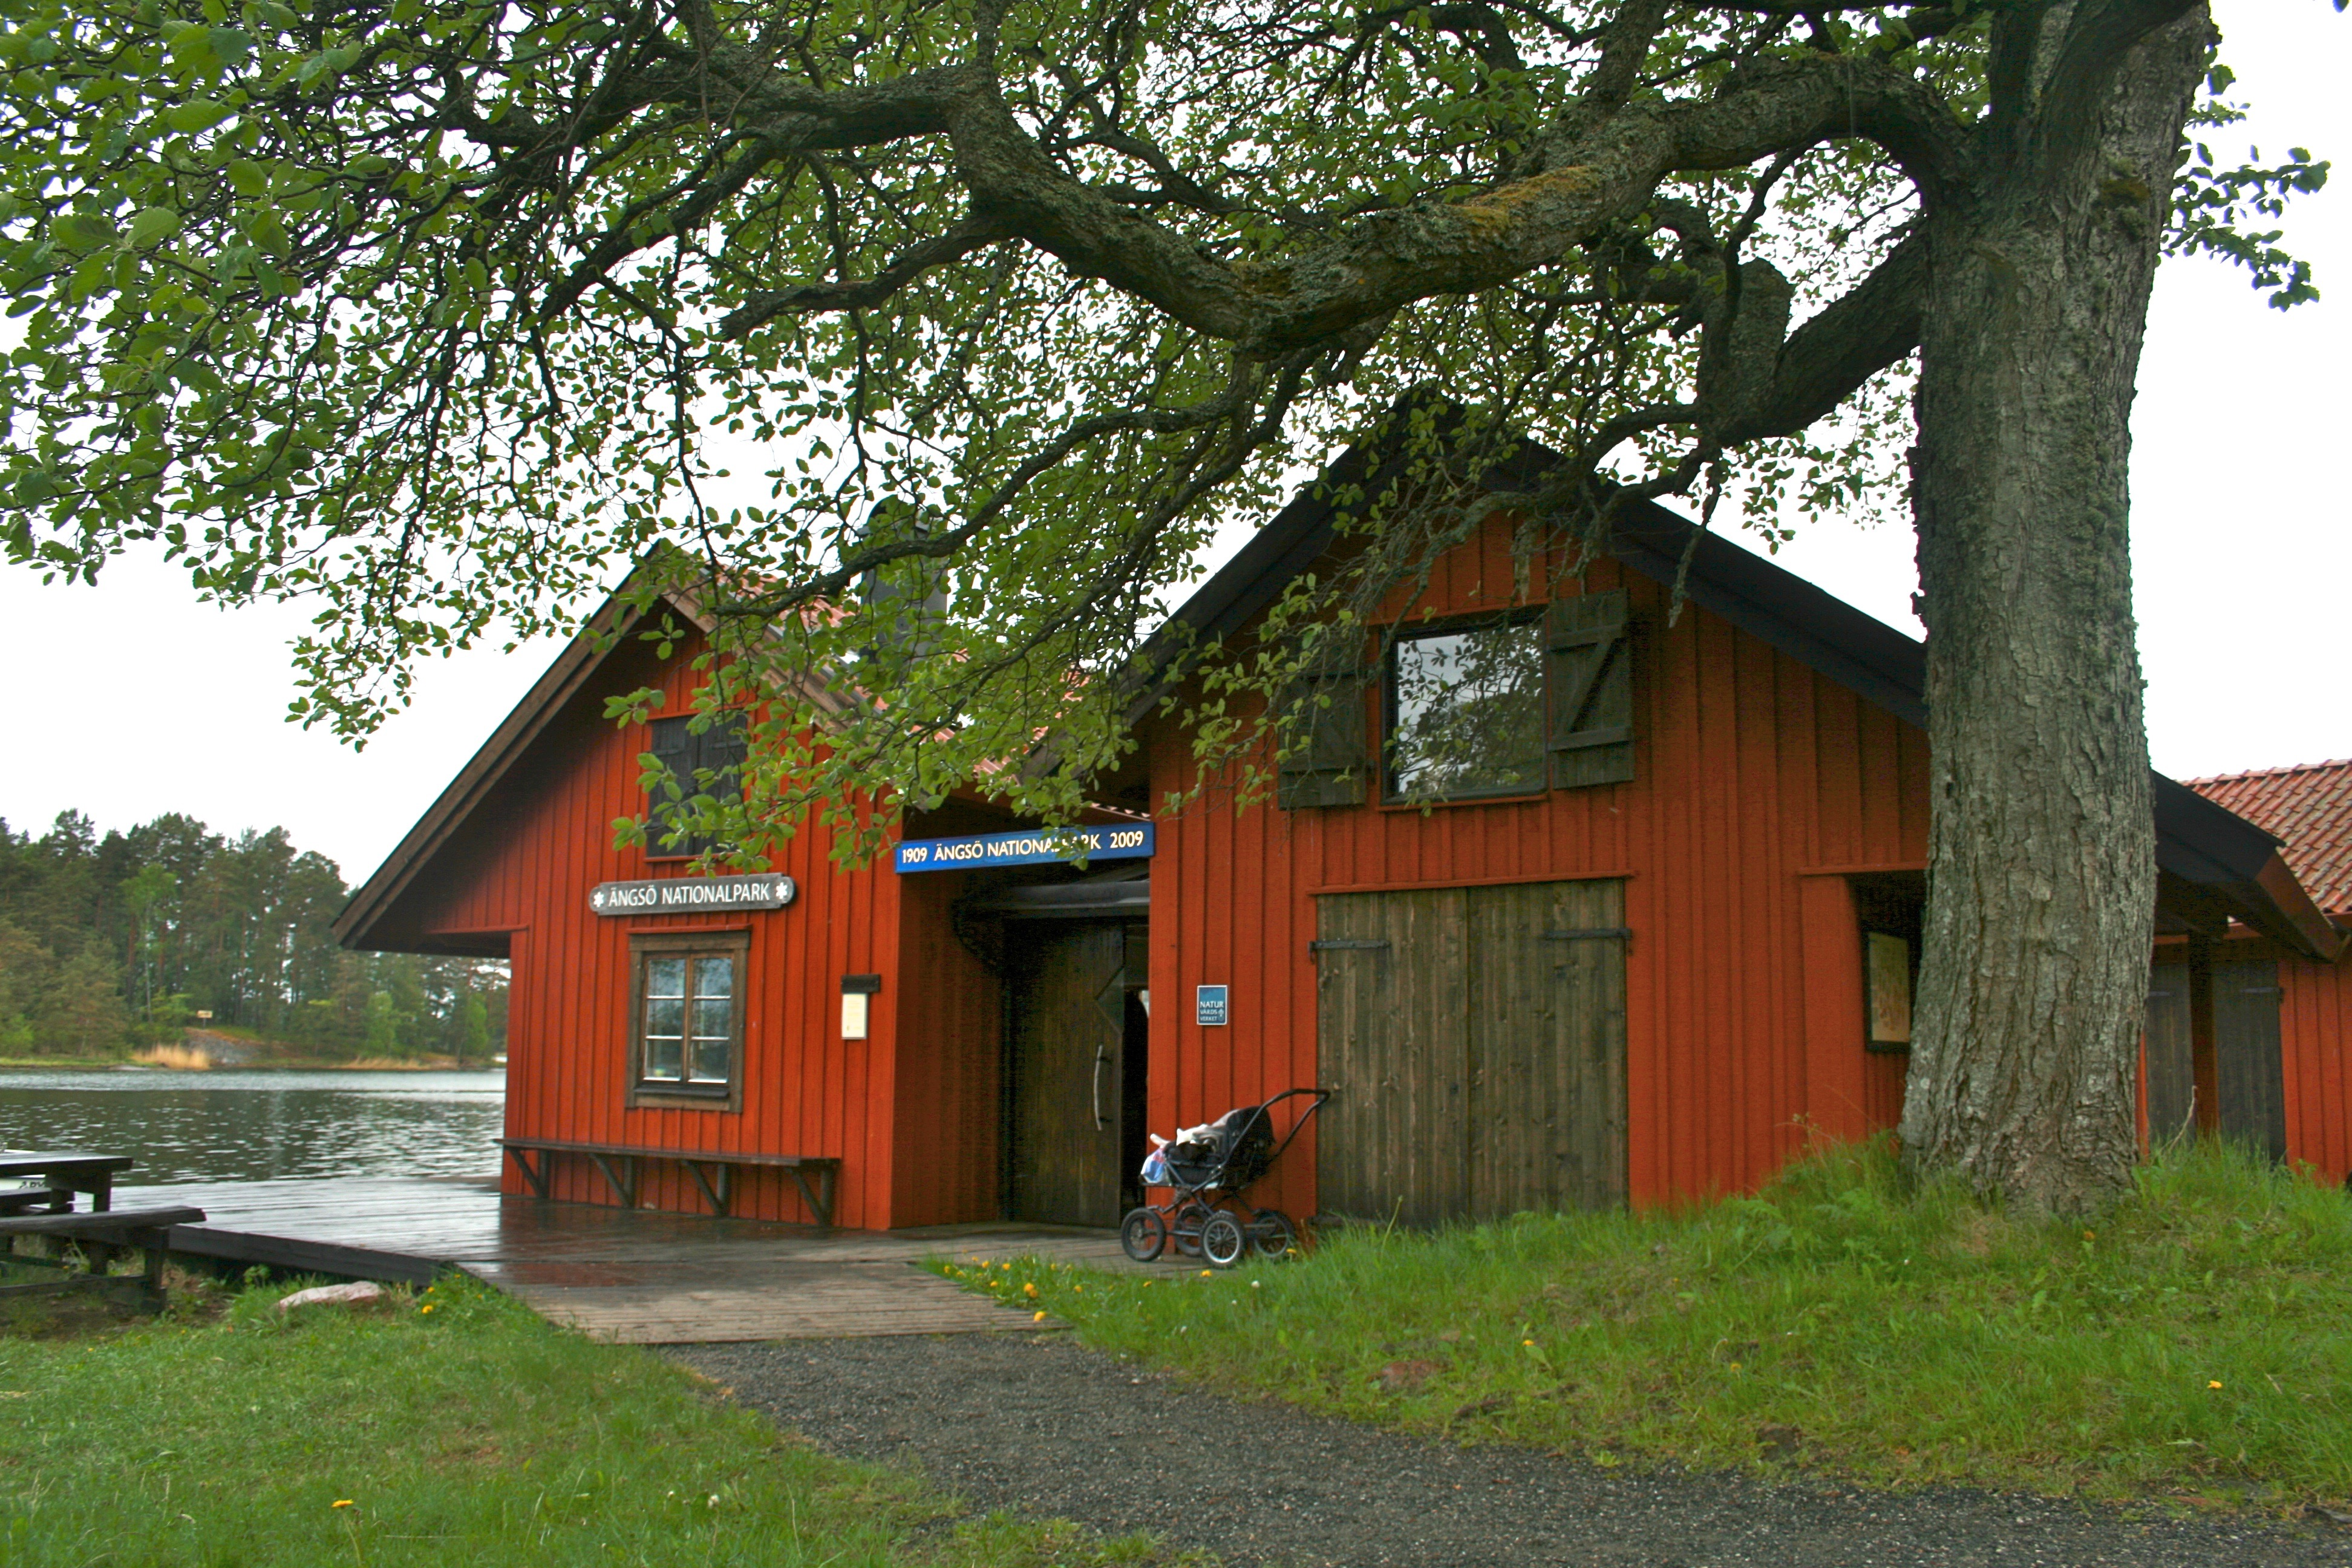 Fileängsö Nationalpark Visitor Centerjpg Wikimedia Commons